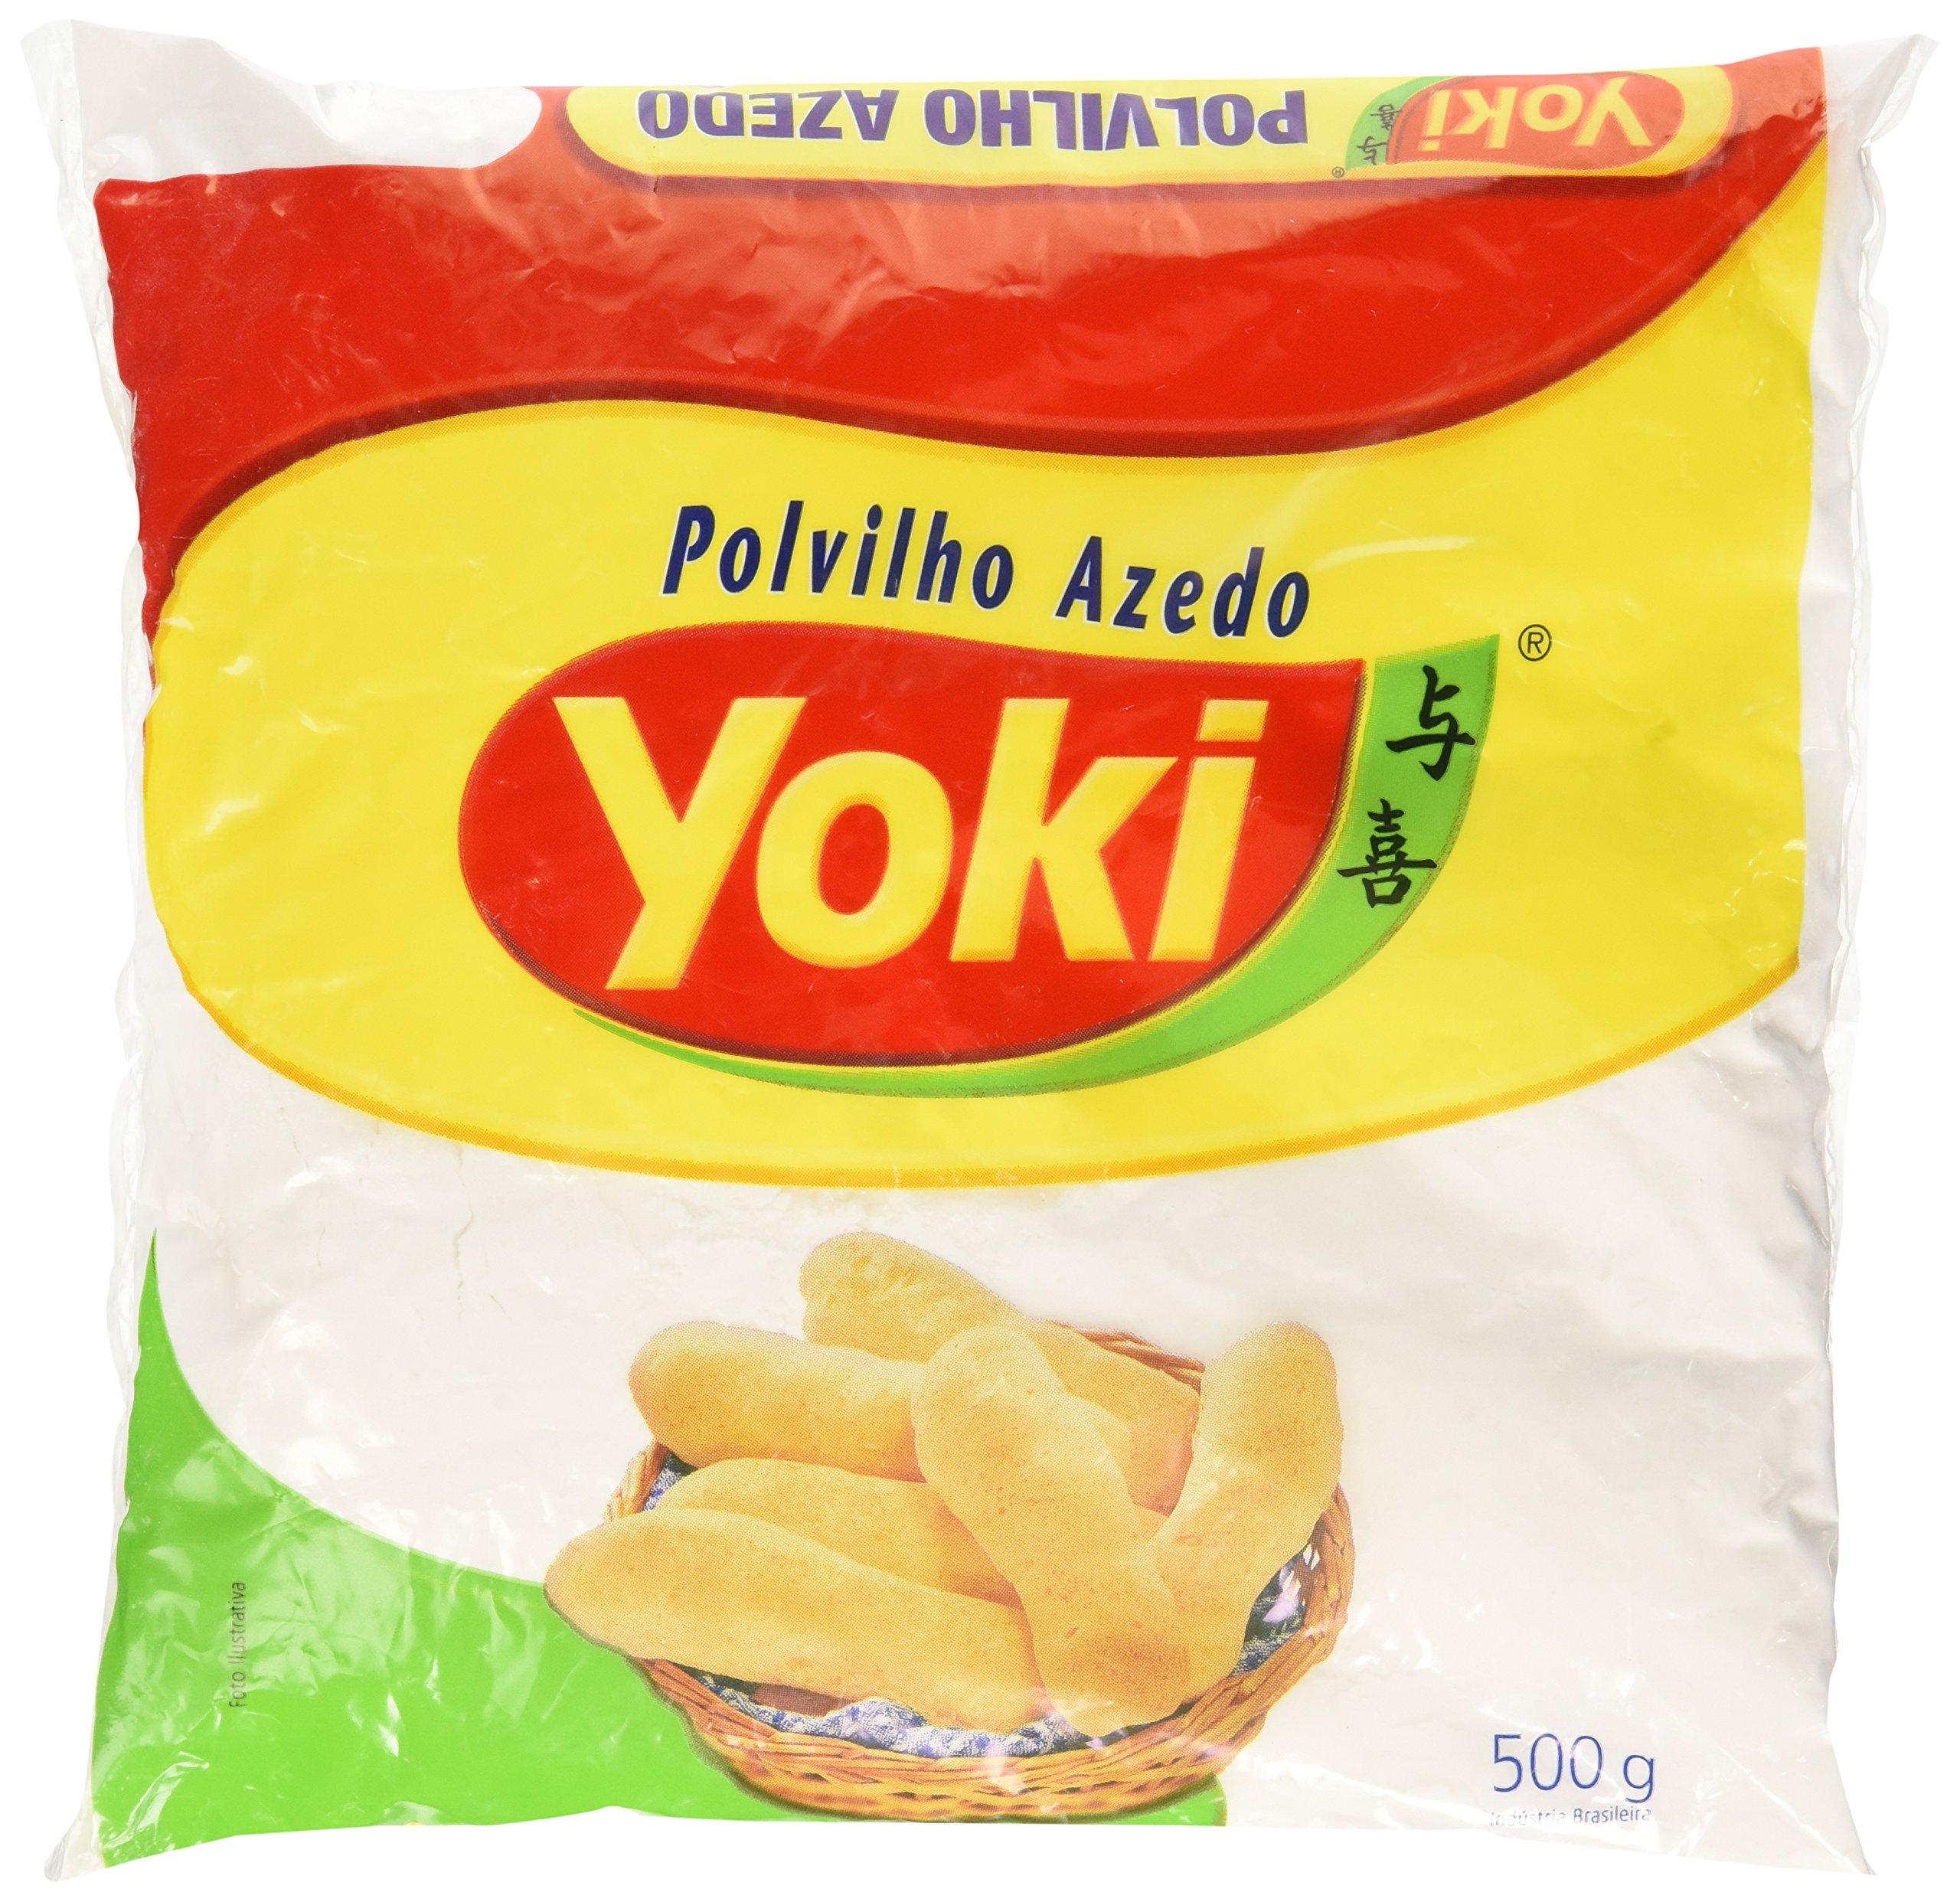 Sour Starch - Polvilho Azedo - Yoki - 17.6 (oz 500g) - GLUTEN FREE